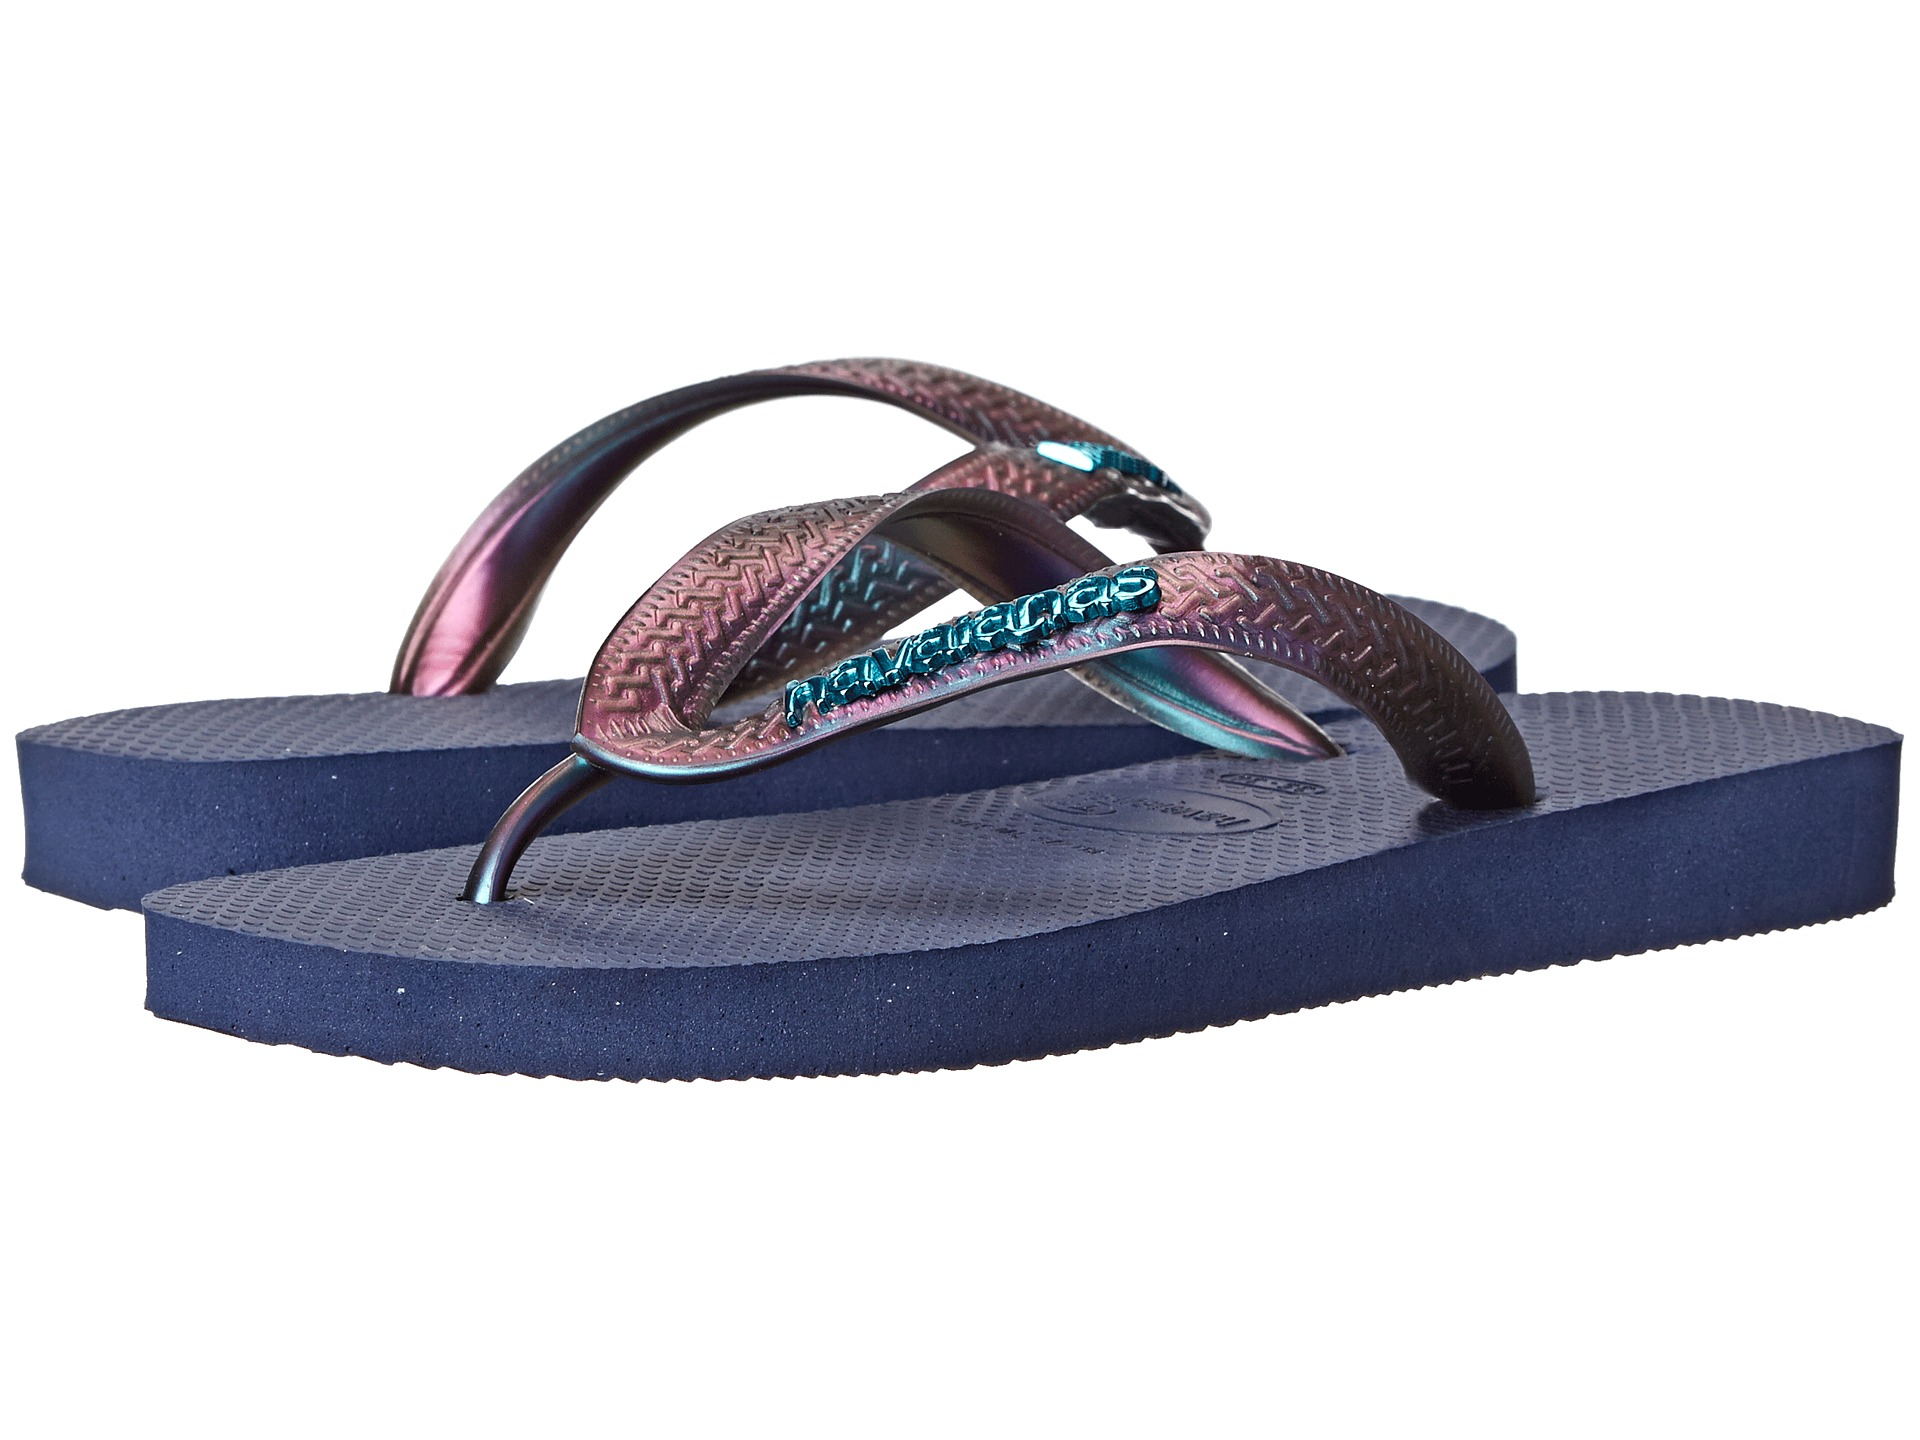 c7b6d86d6 Lyst - Havaianas Top Furta Cor Flip Flop in Blue